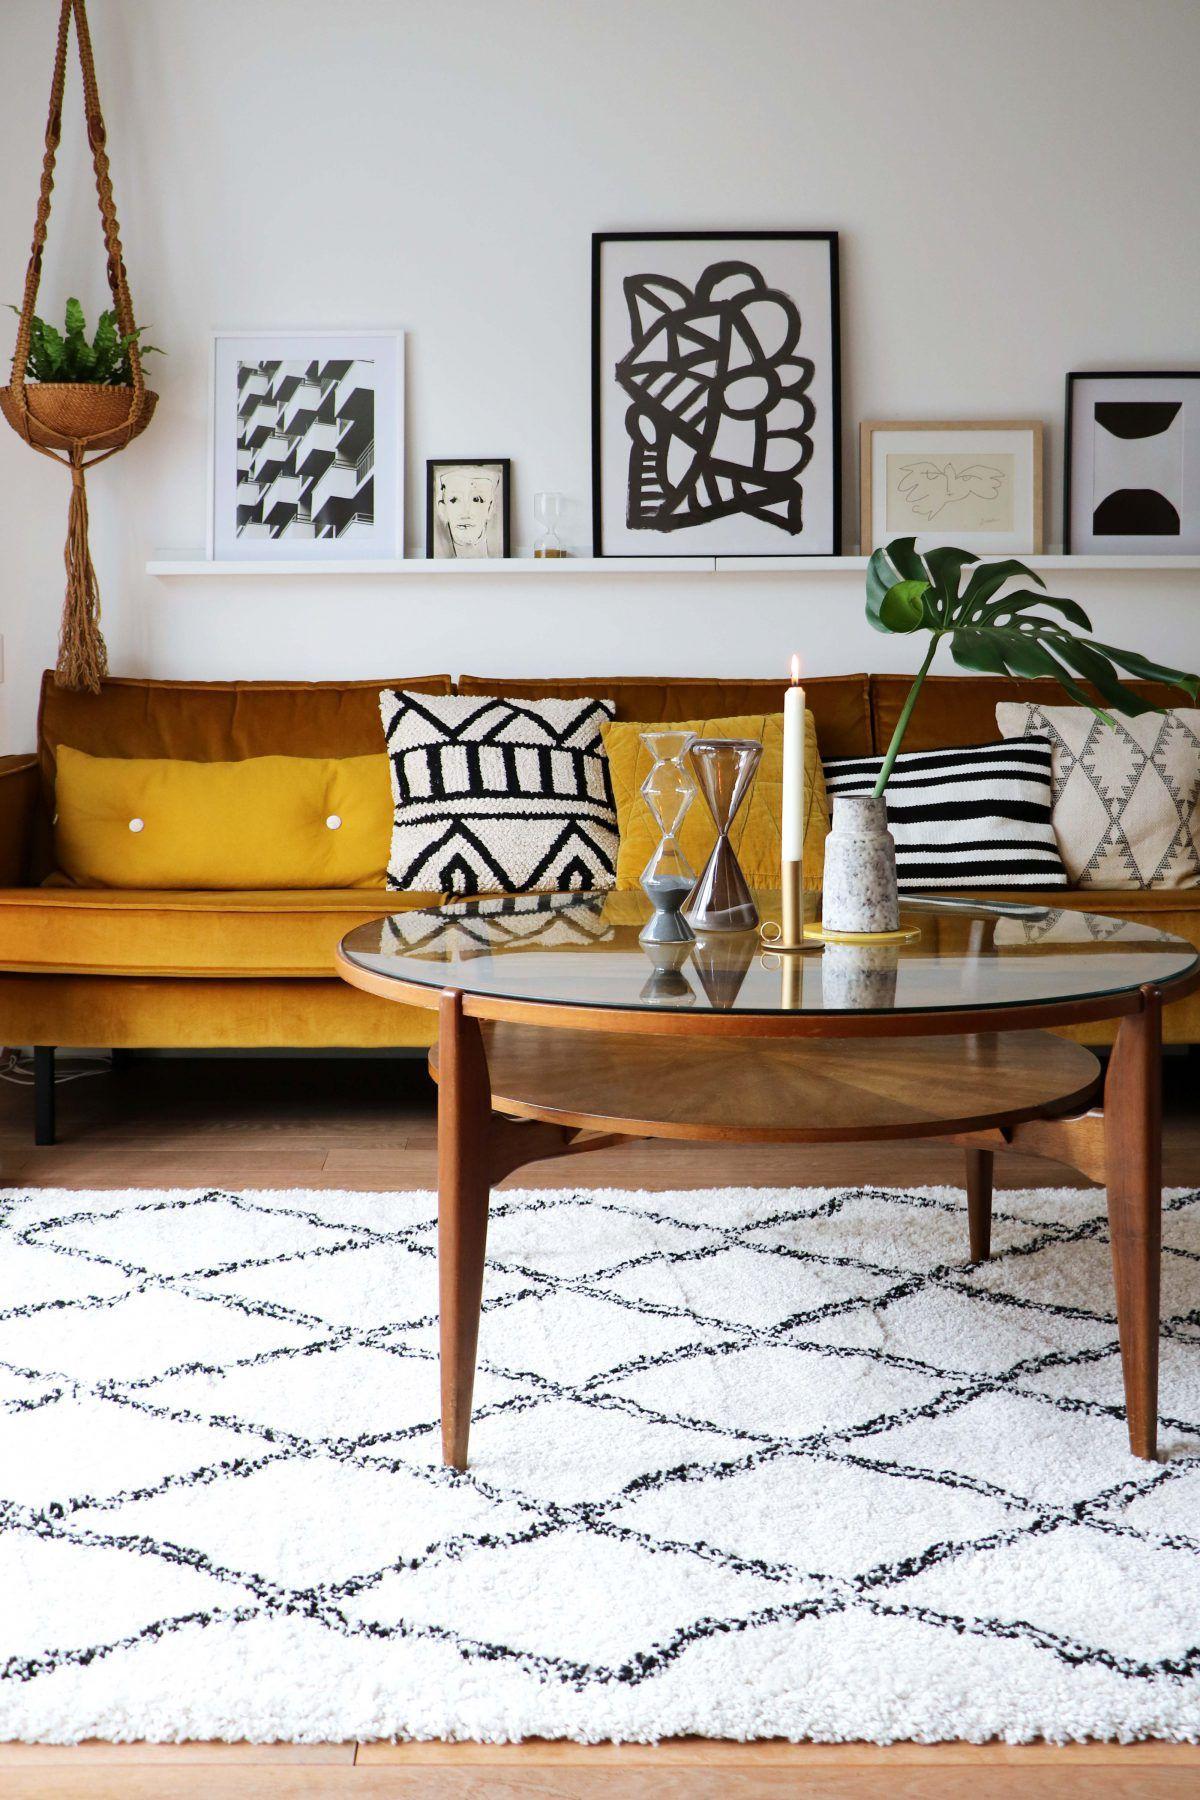 Decorative Matching Living Room: Mix & Match Met Woonstijlen